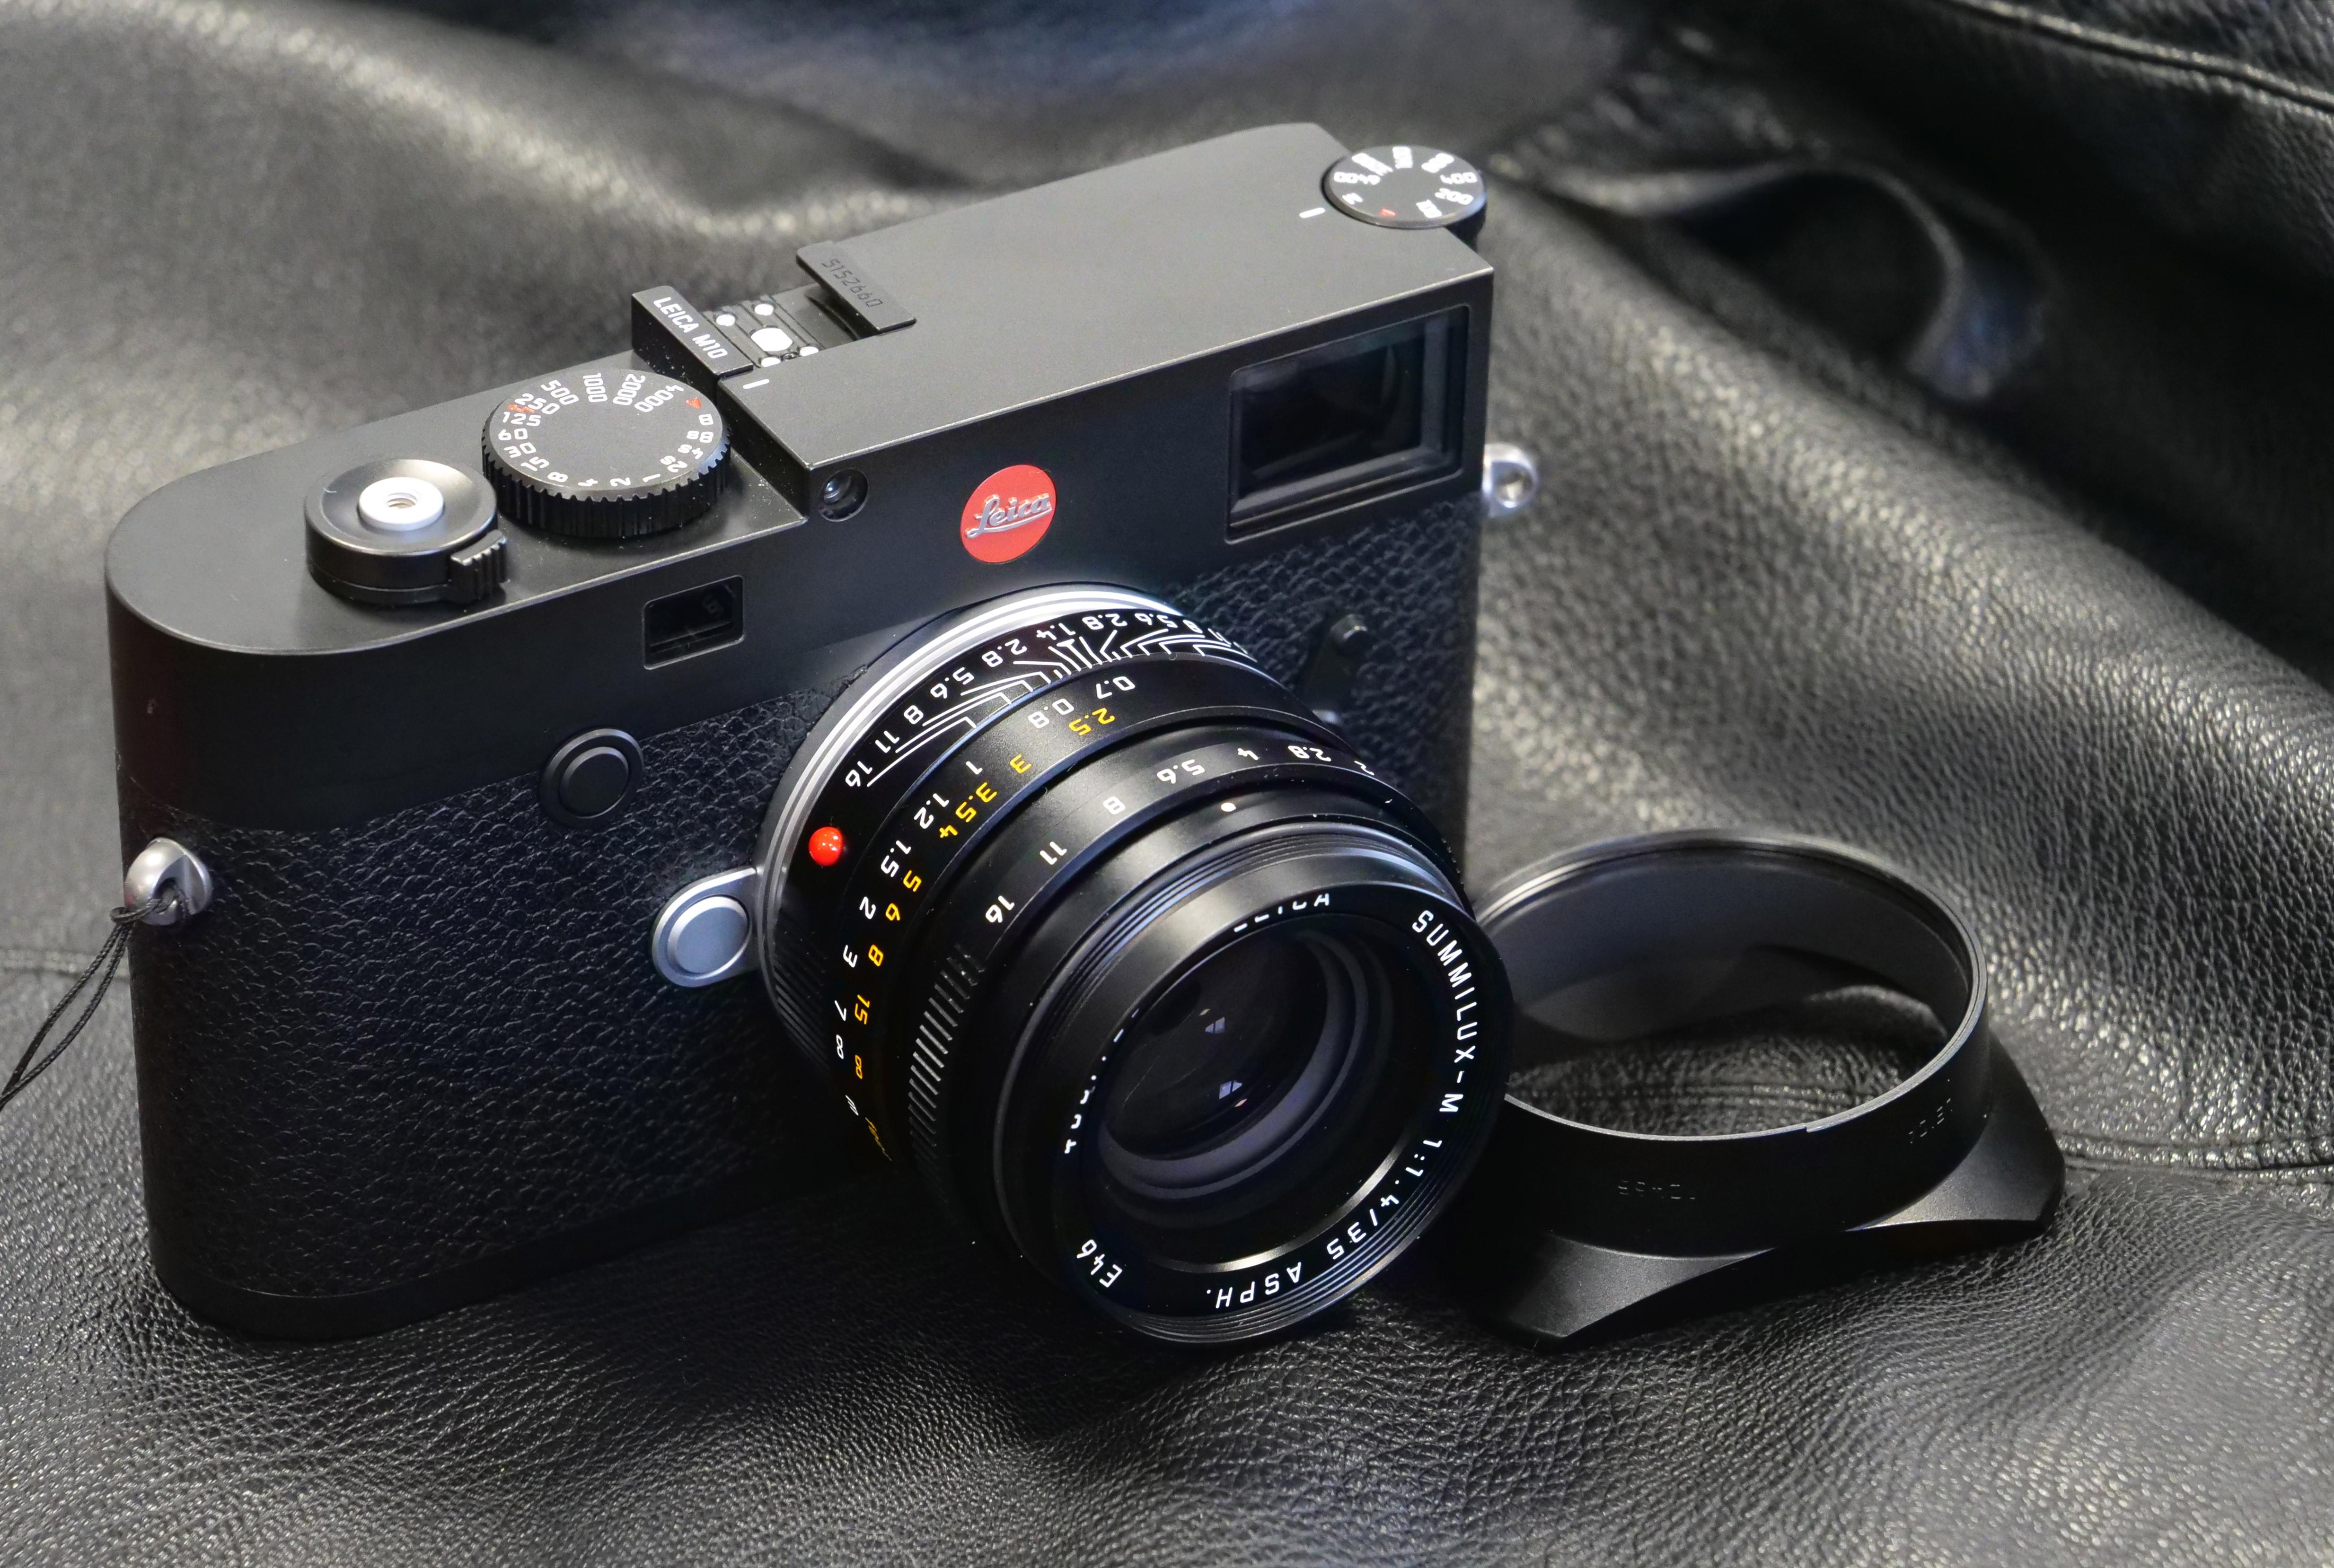 Leica M10 Digital Rangefinder Full Review | ePHOTOzine